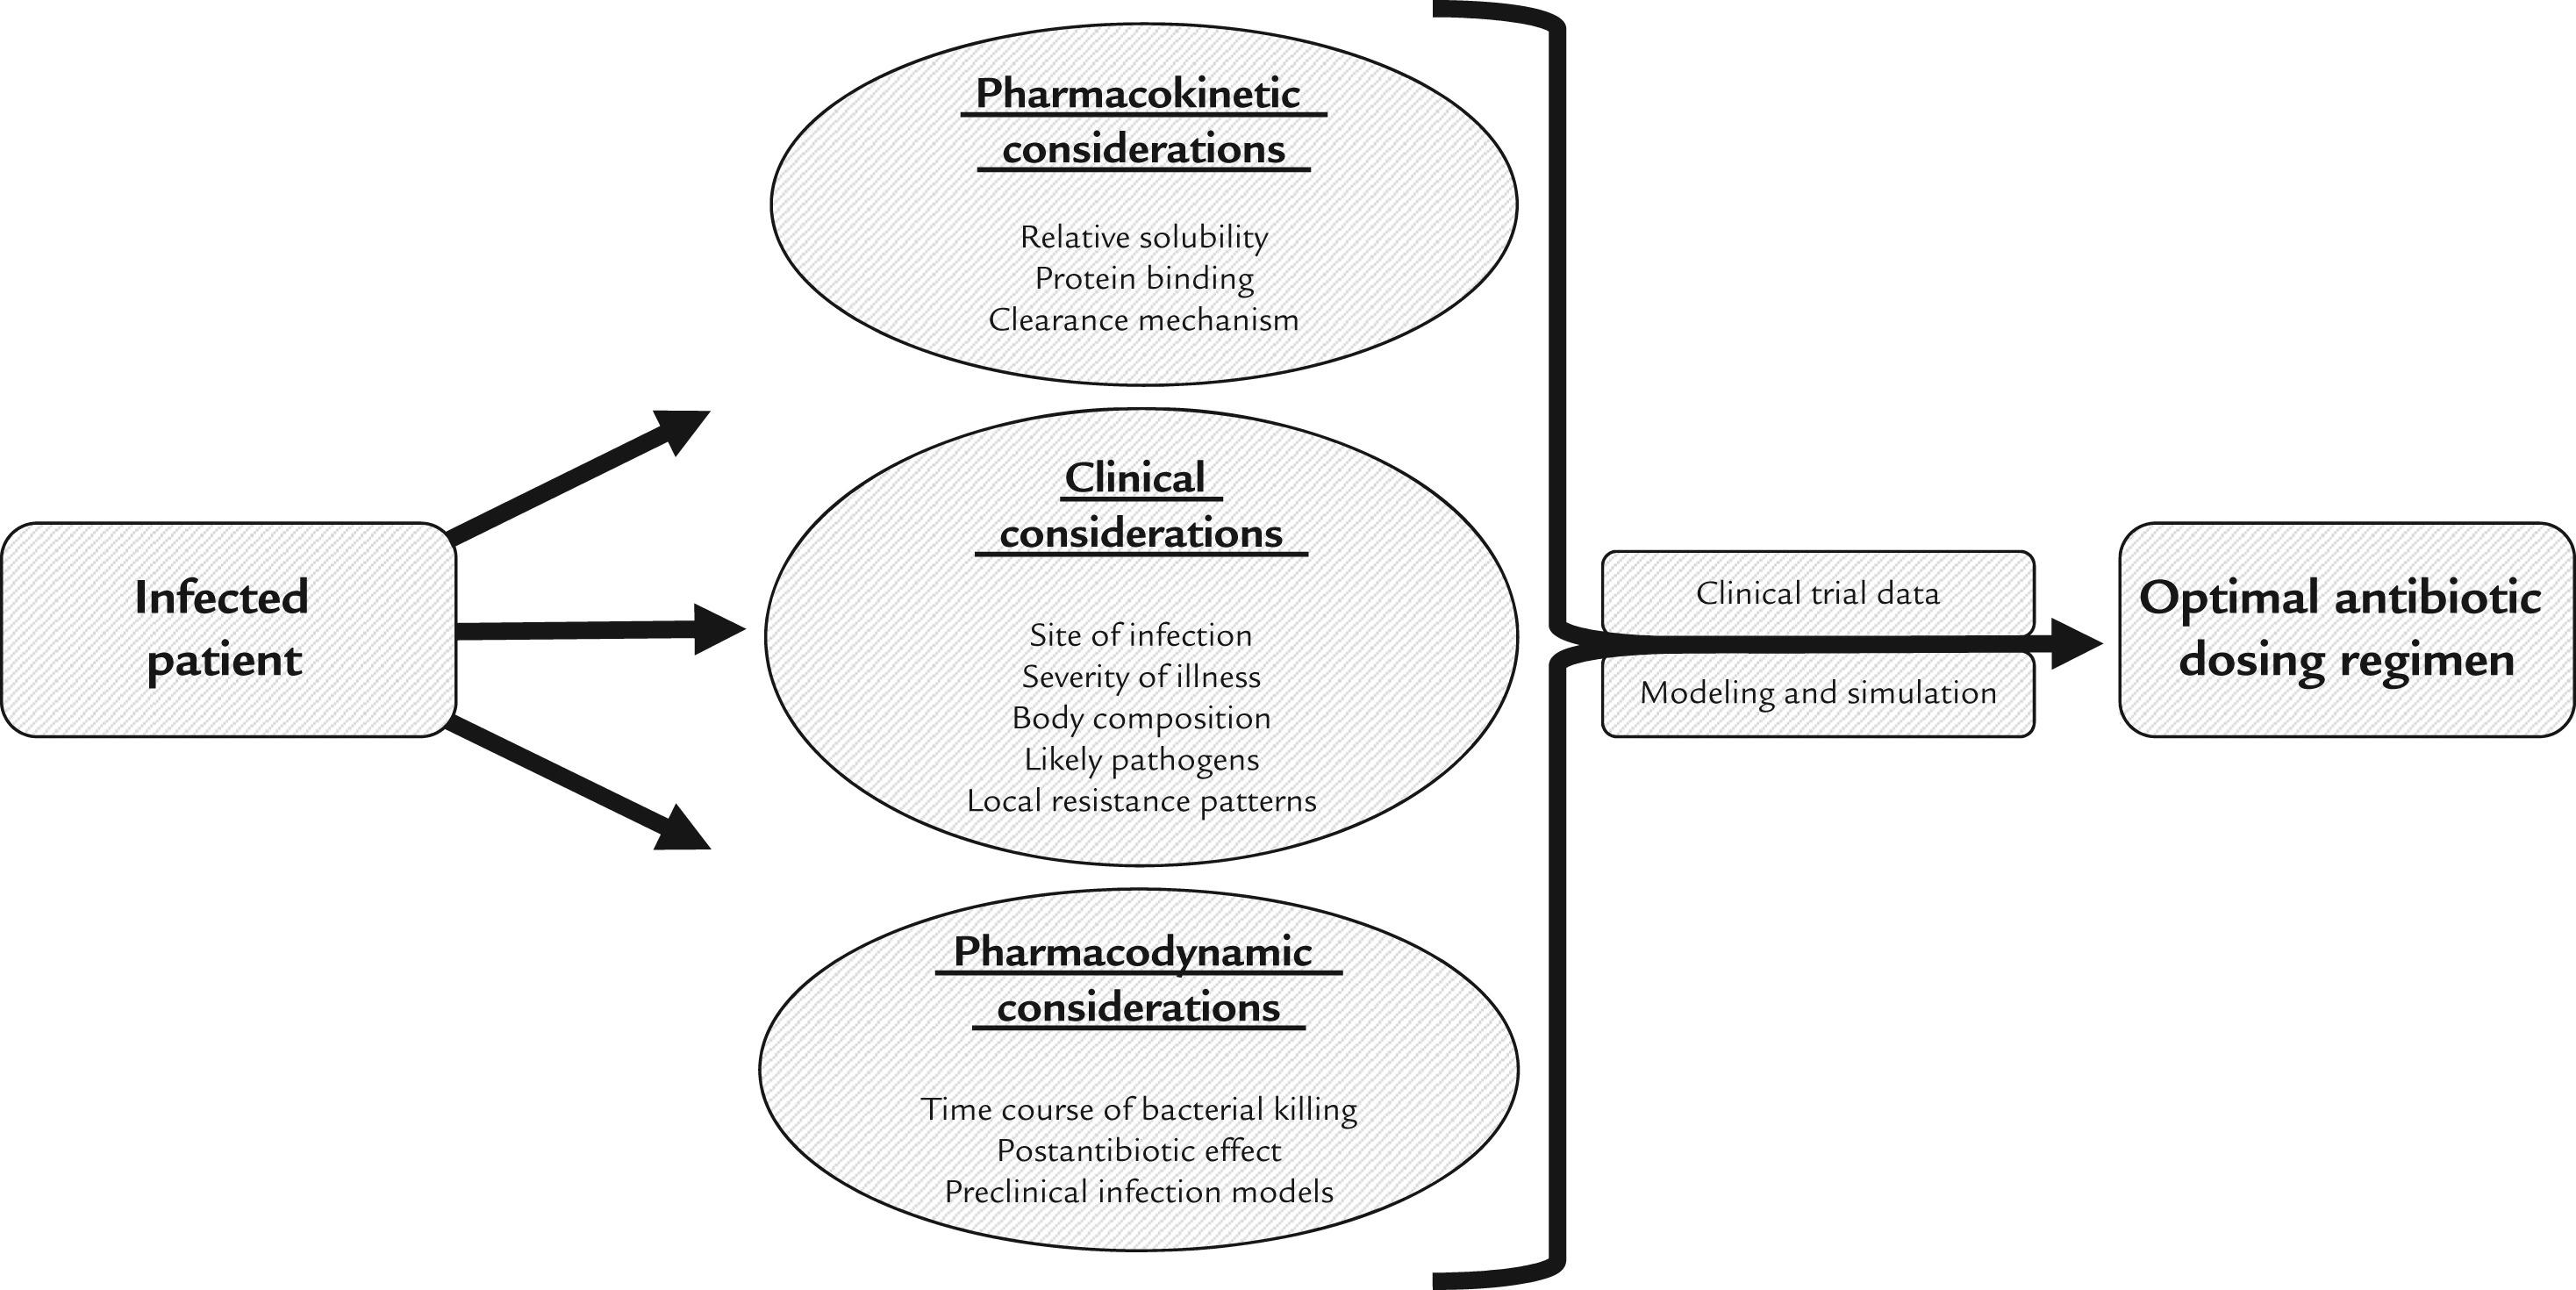 Pharmacokinetic and Pharmacodynamic Principles of Anti